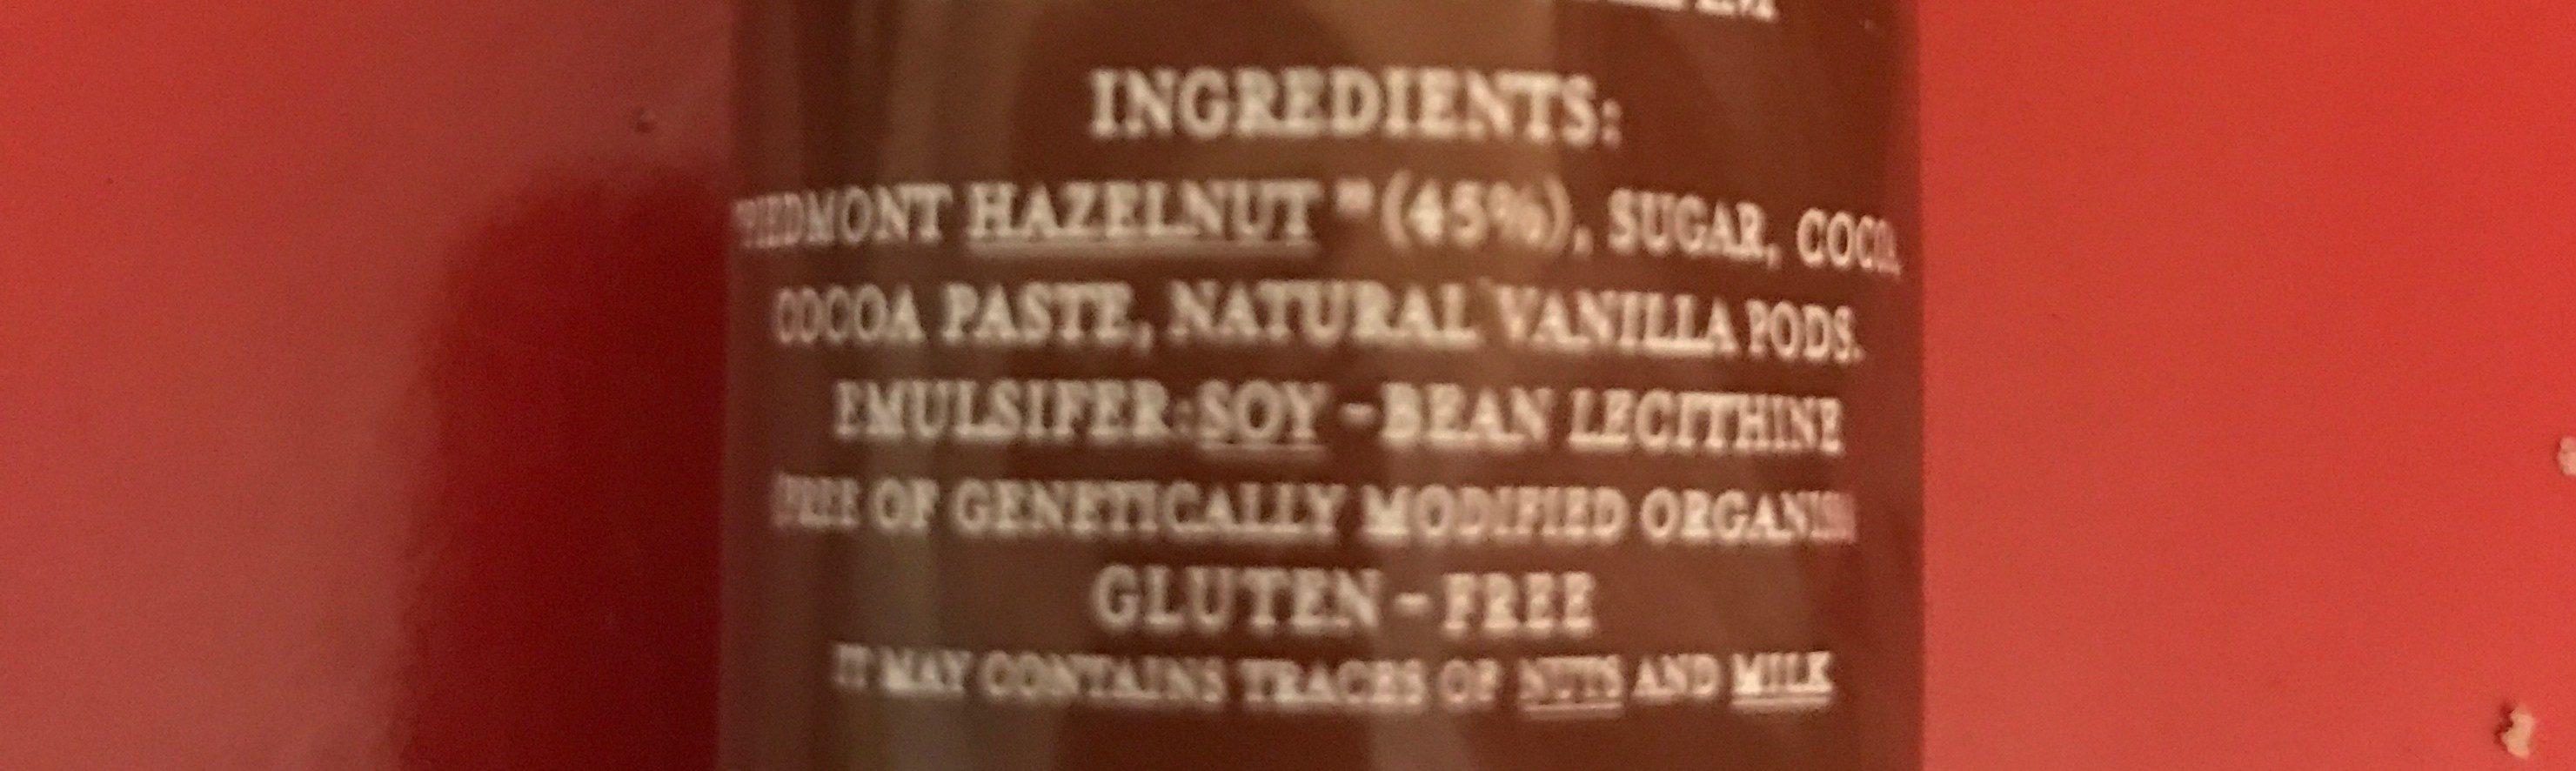 Gianduioso - Ingrediënten